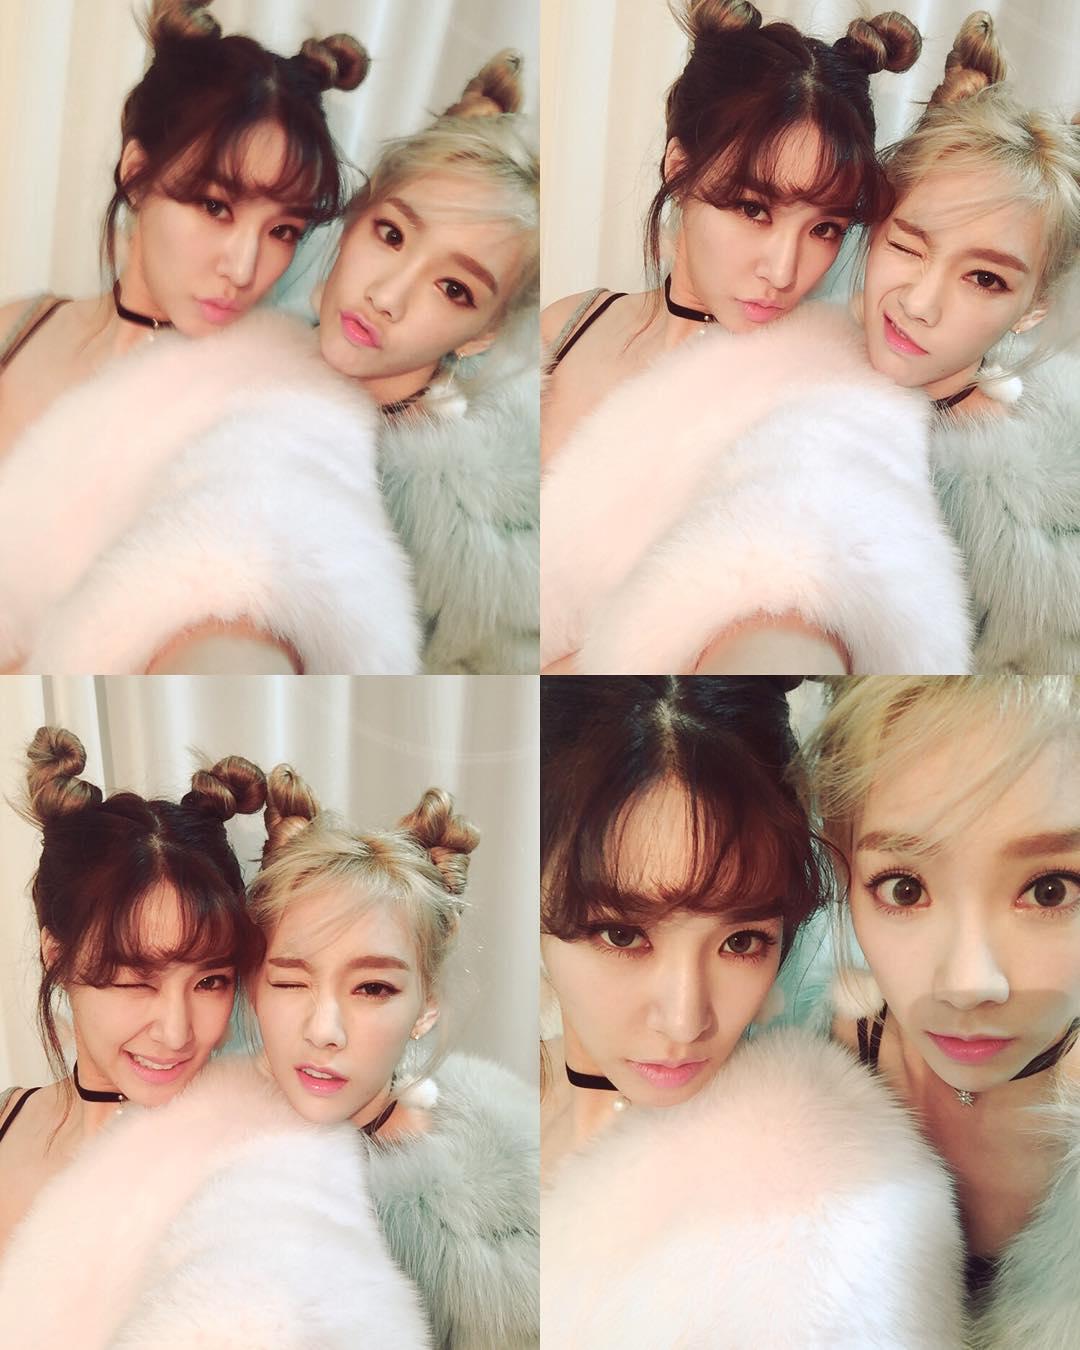 Tiffany, Taeyeon - Girls Generation